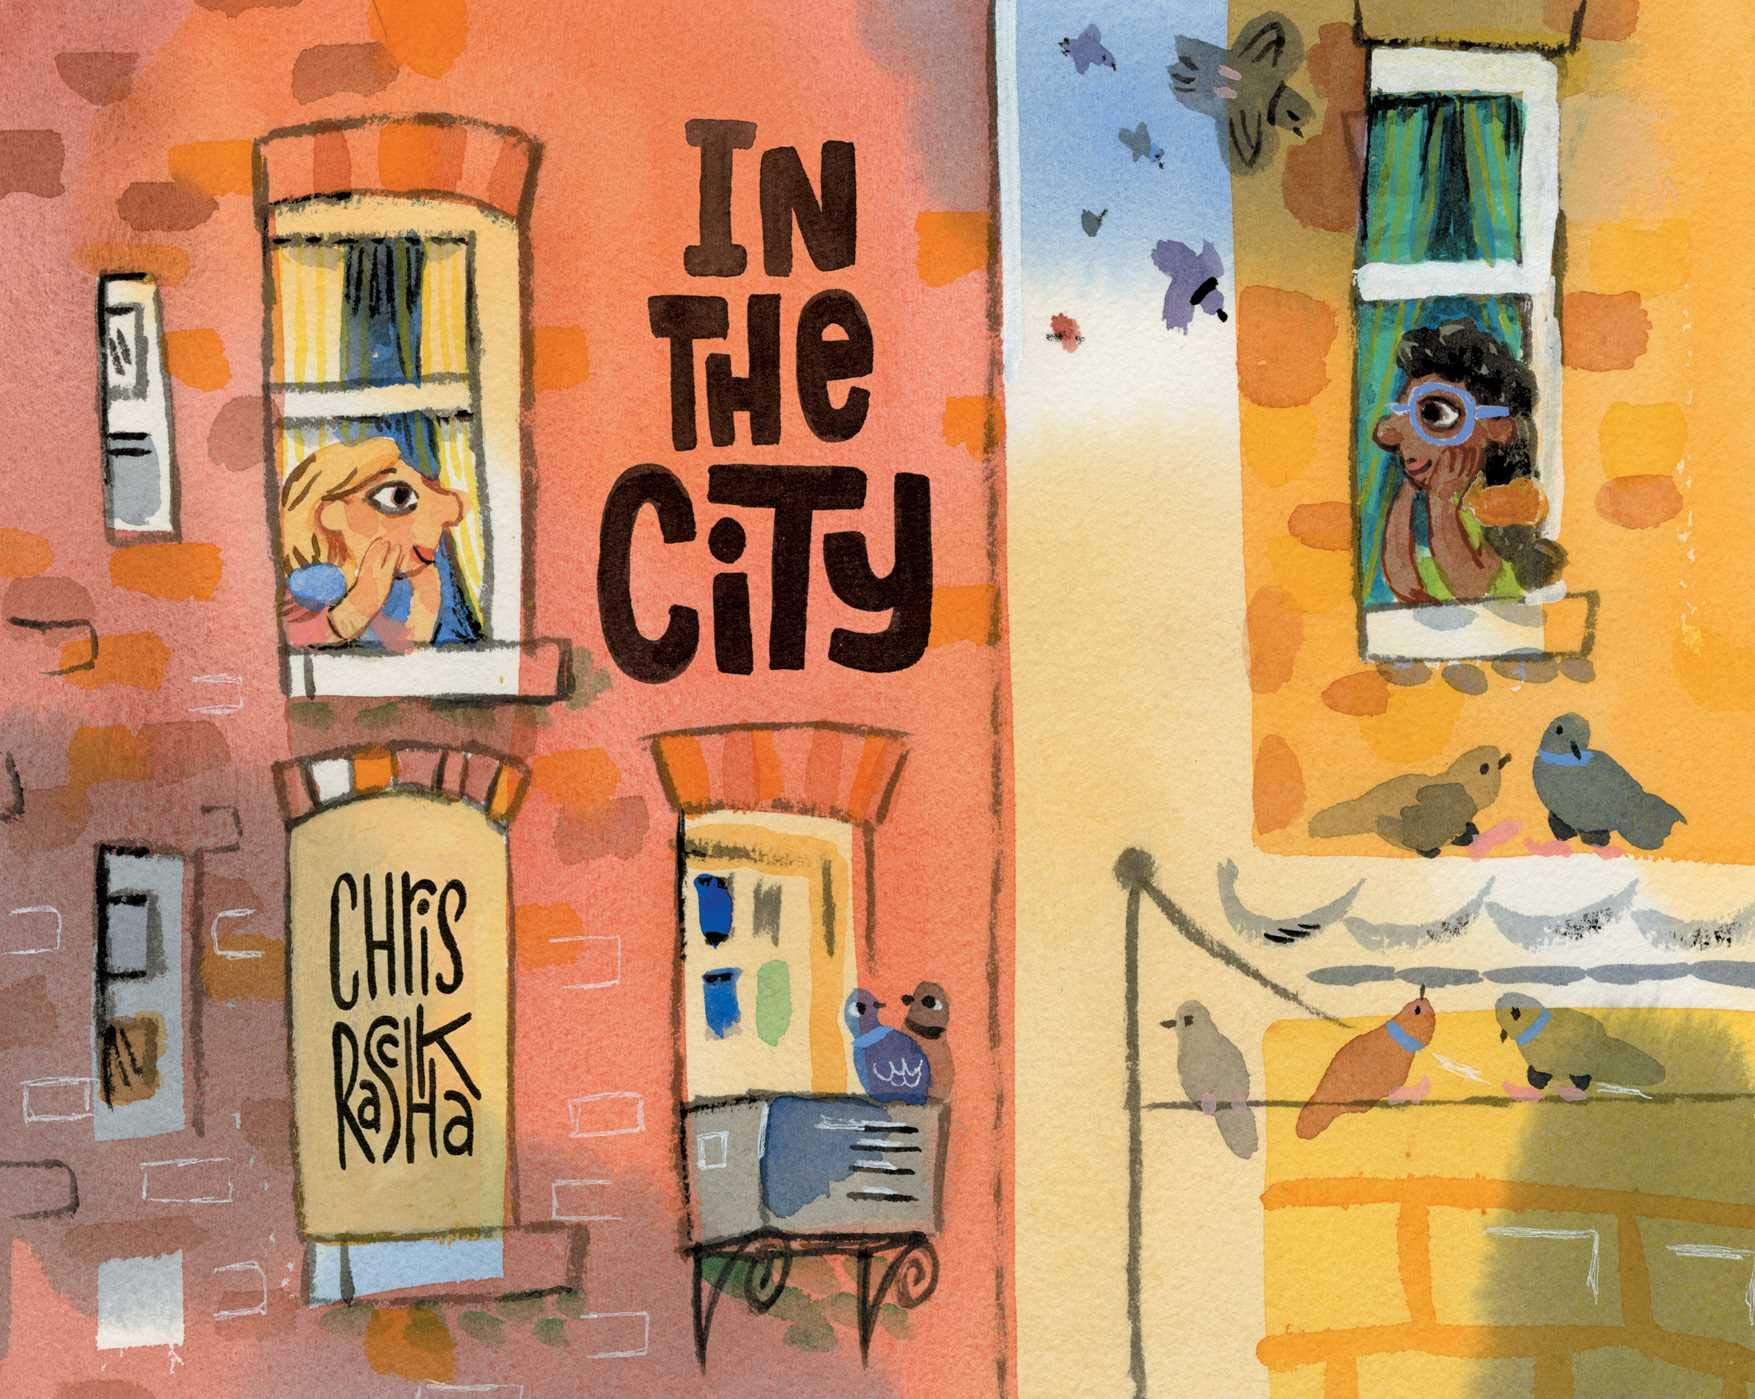 In the City: Raschka, Chris, Raschka, Chris: 9781481486279: Amazon.com: Books